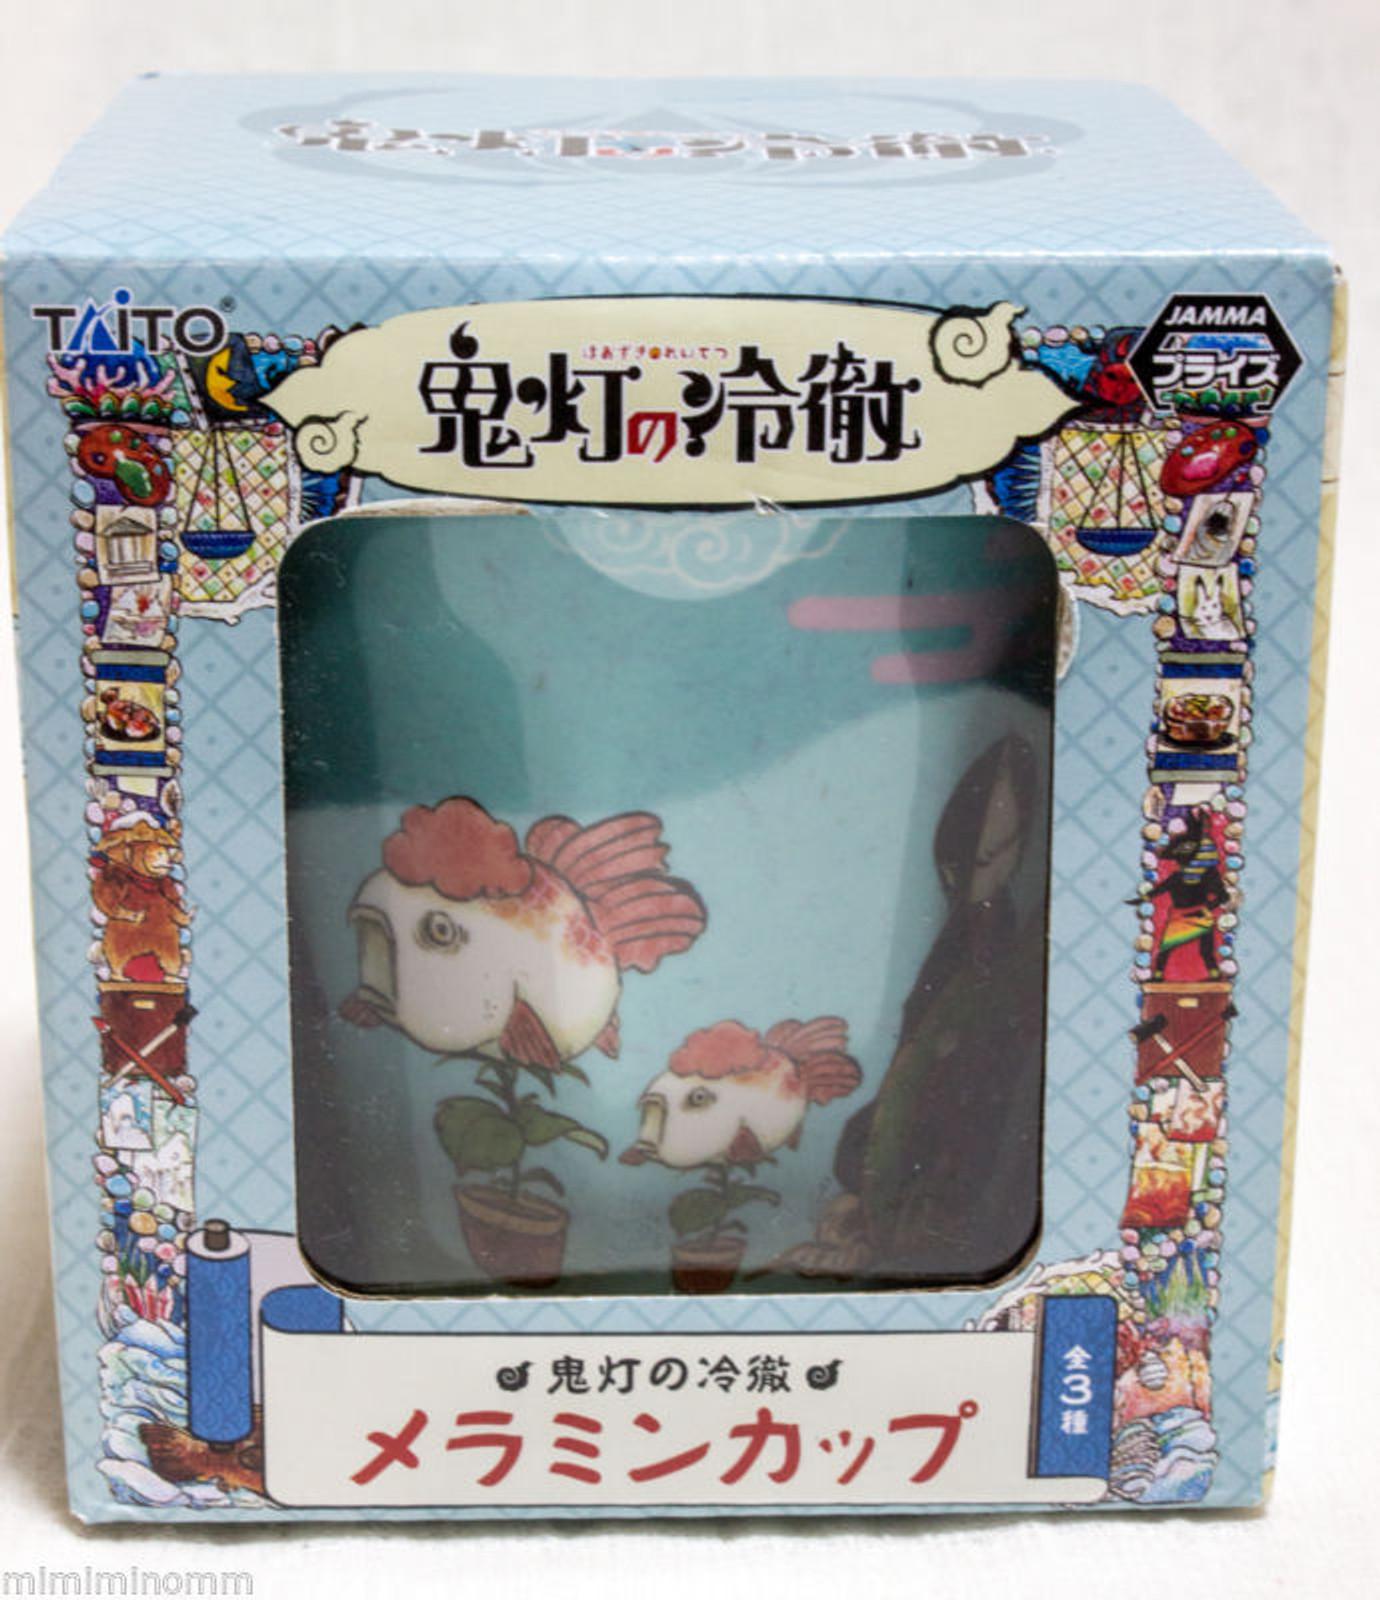 Hozuki no Reitetsu Melamine Art Cup Hozuki & Goldfish Grass Ver. Taito JAPAN ANIME MANGA